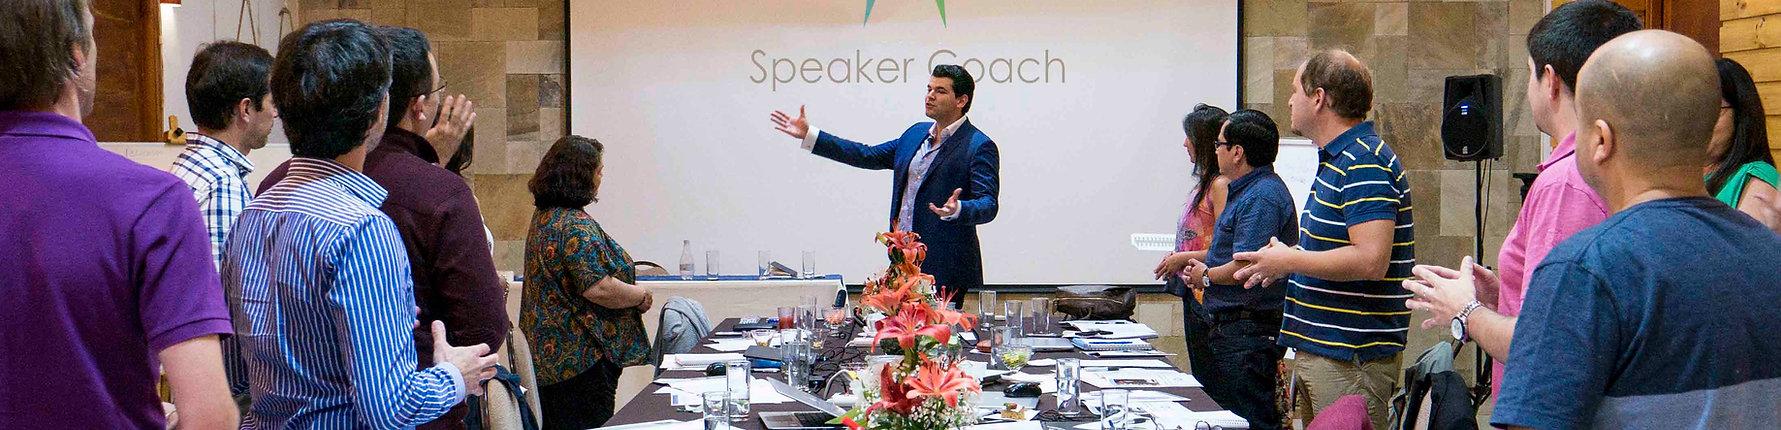 SpeakerCoach Latinoamérica